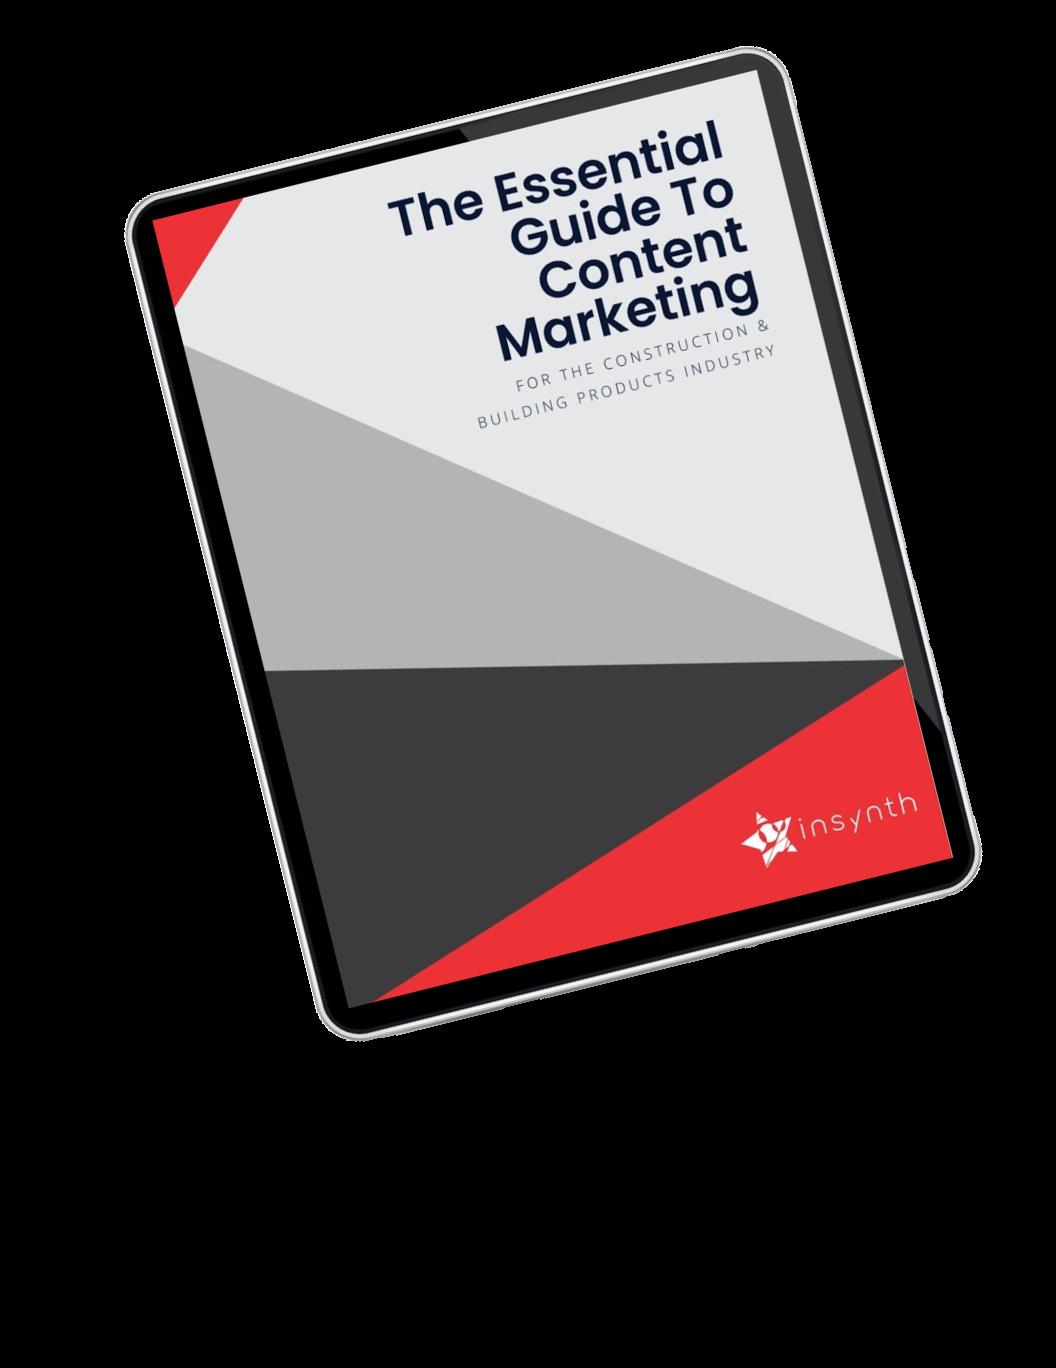 construction-marketing-webiste-SEO-optimisation-construction-web-design-specifiers-lead-gen-content-marketing-ebook